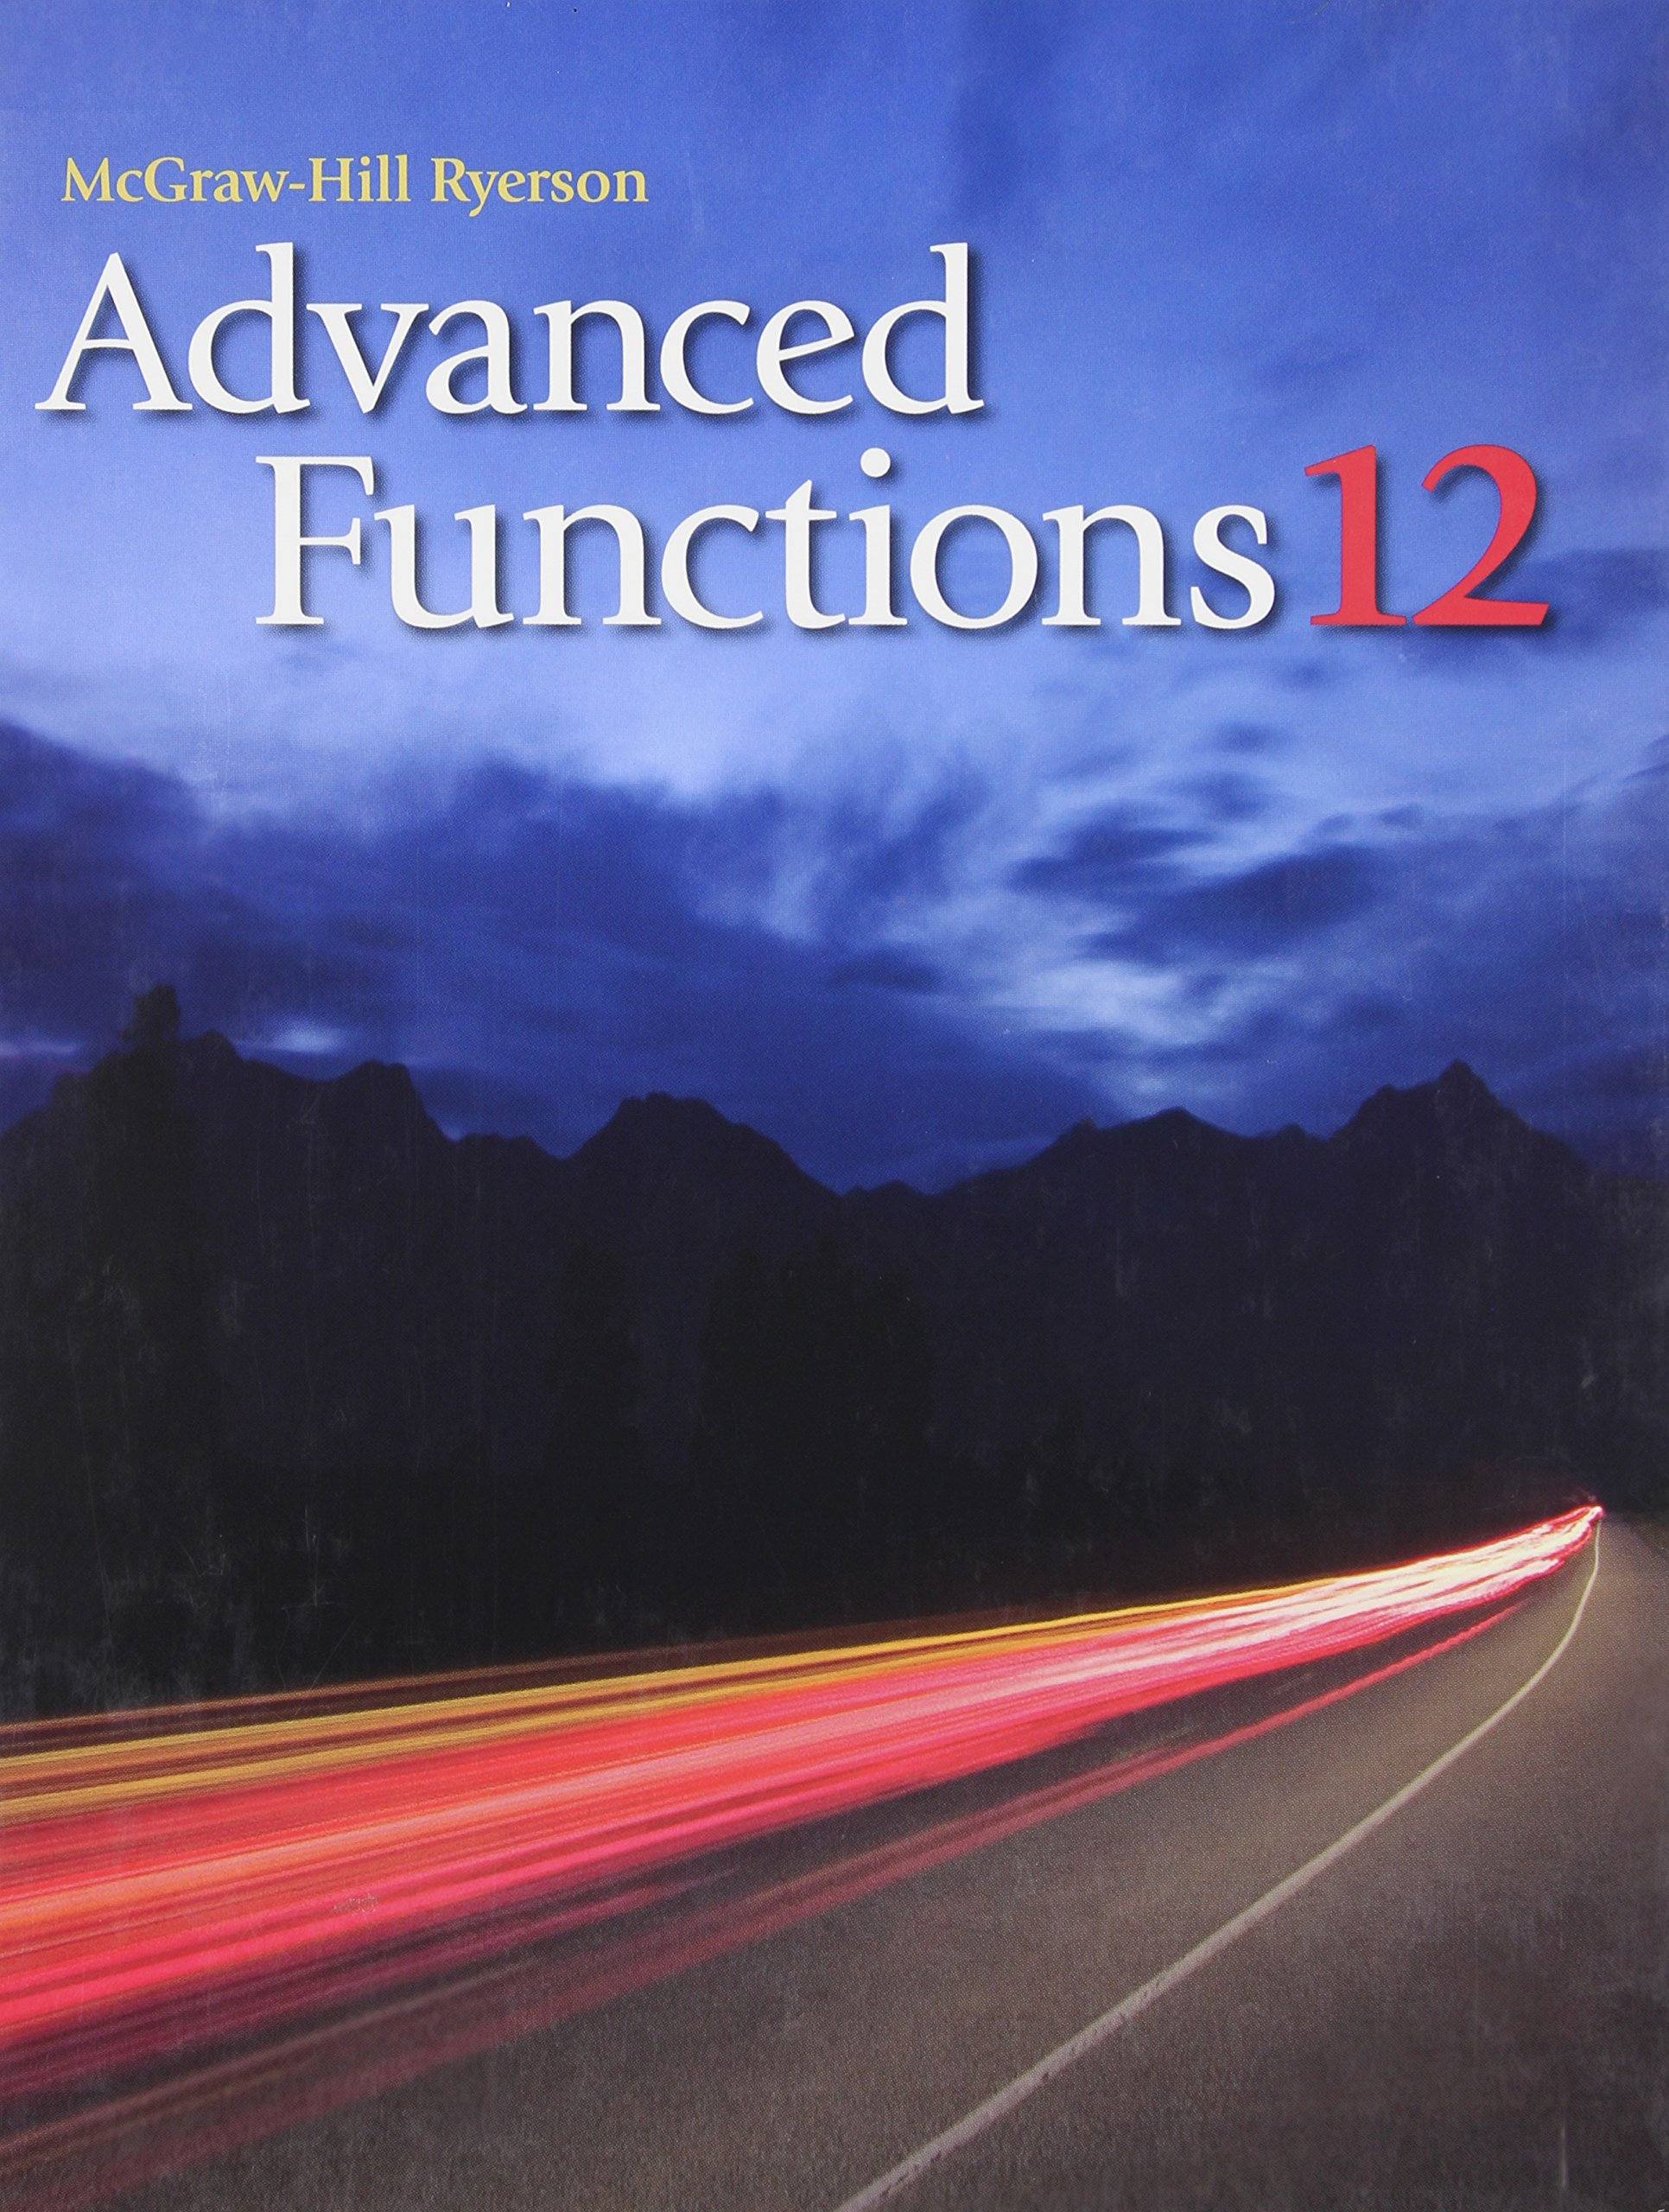 Advanced Functions 12 Student Edition: Kirsten Boucher, Dan Ciarmoli, Wayne  Erdman, Patrick Grew, Jeff Irvine, Atul Kotecha, Antonietta Lenjosek, ...